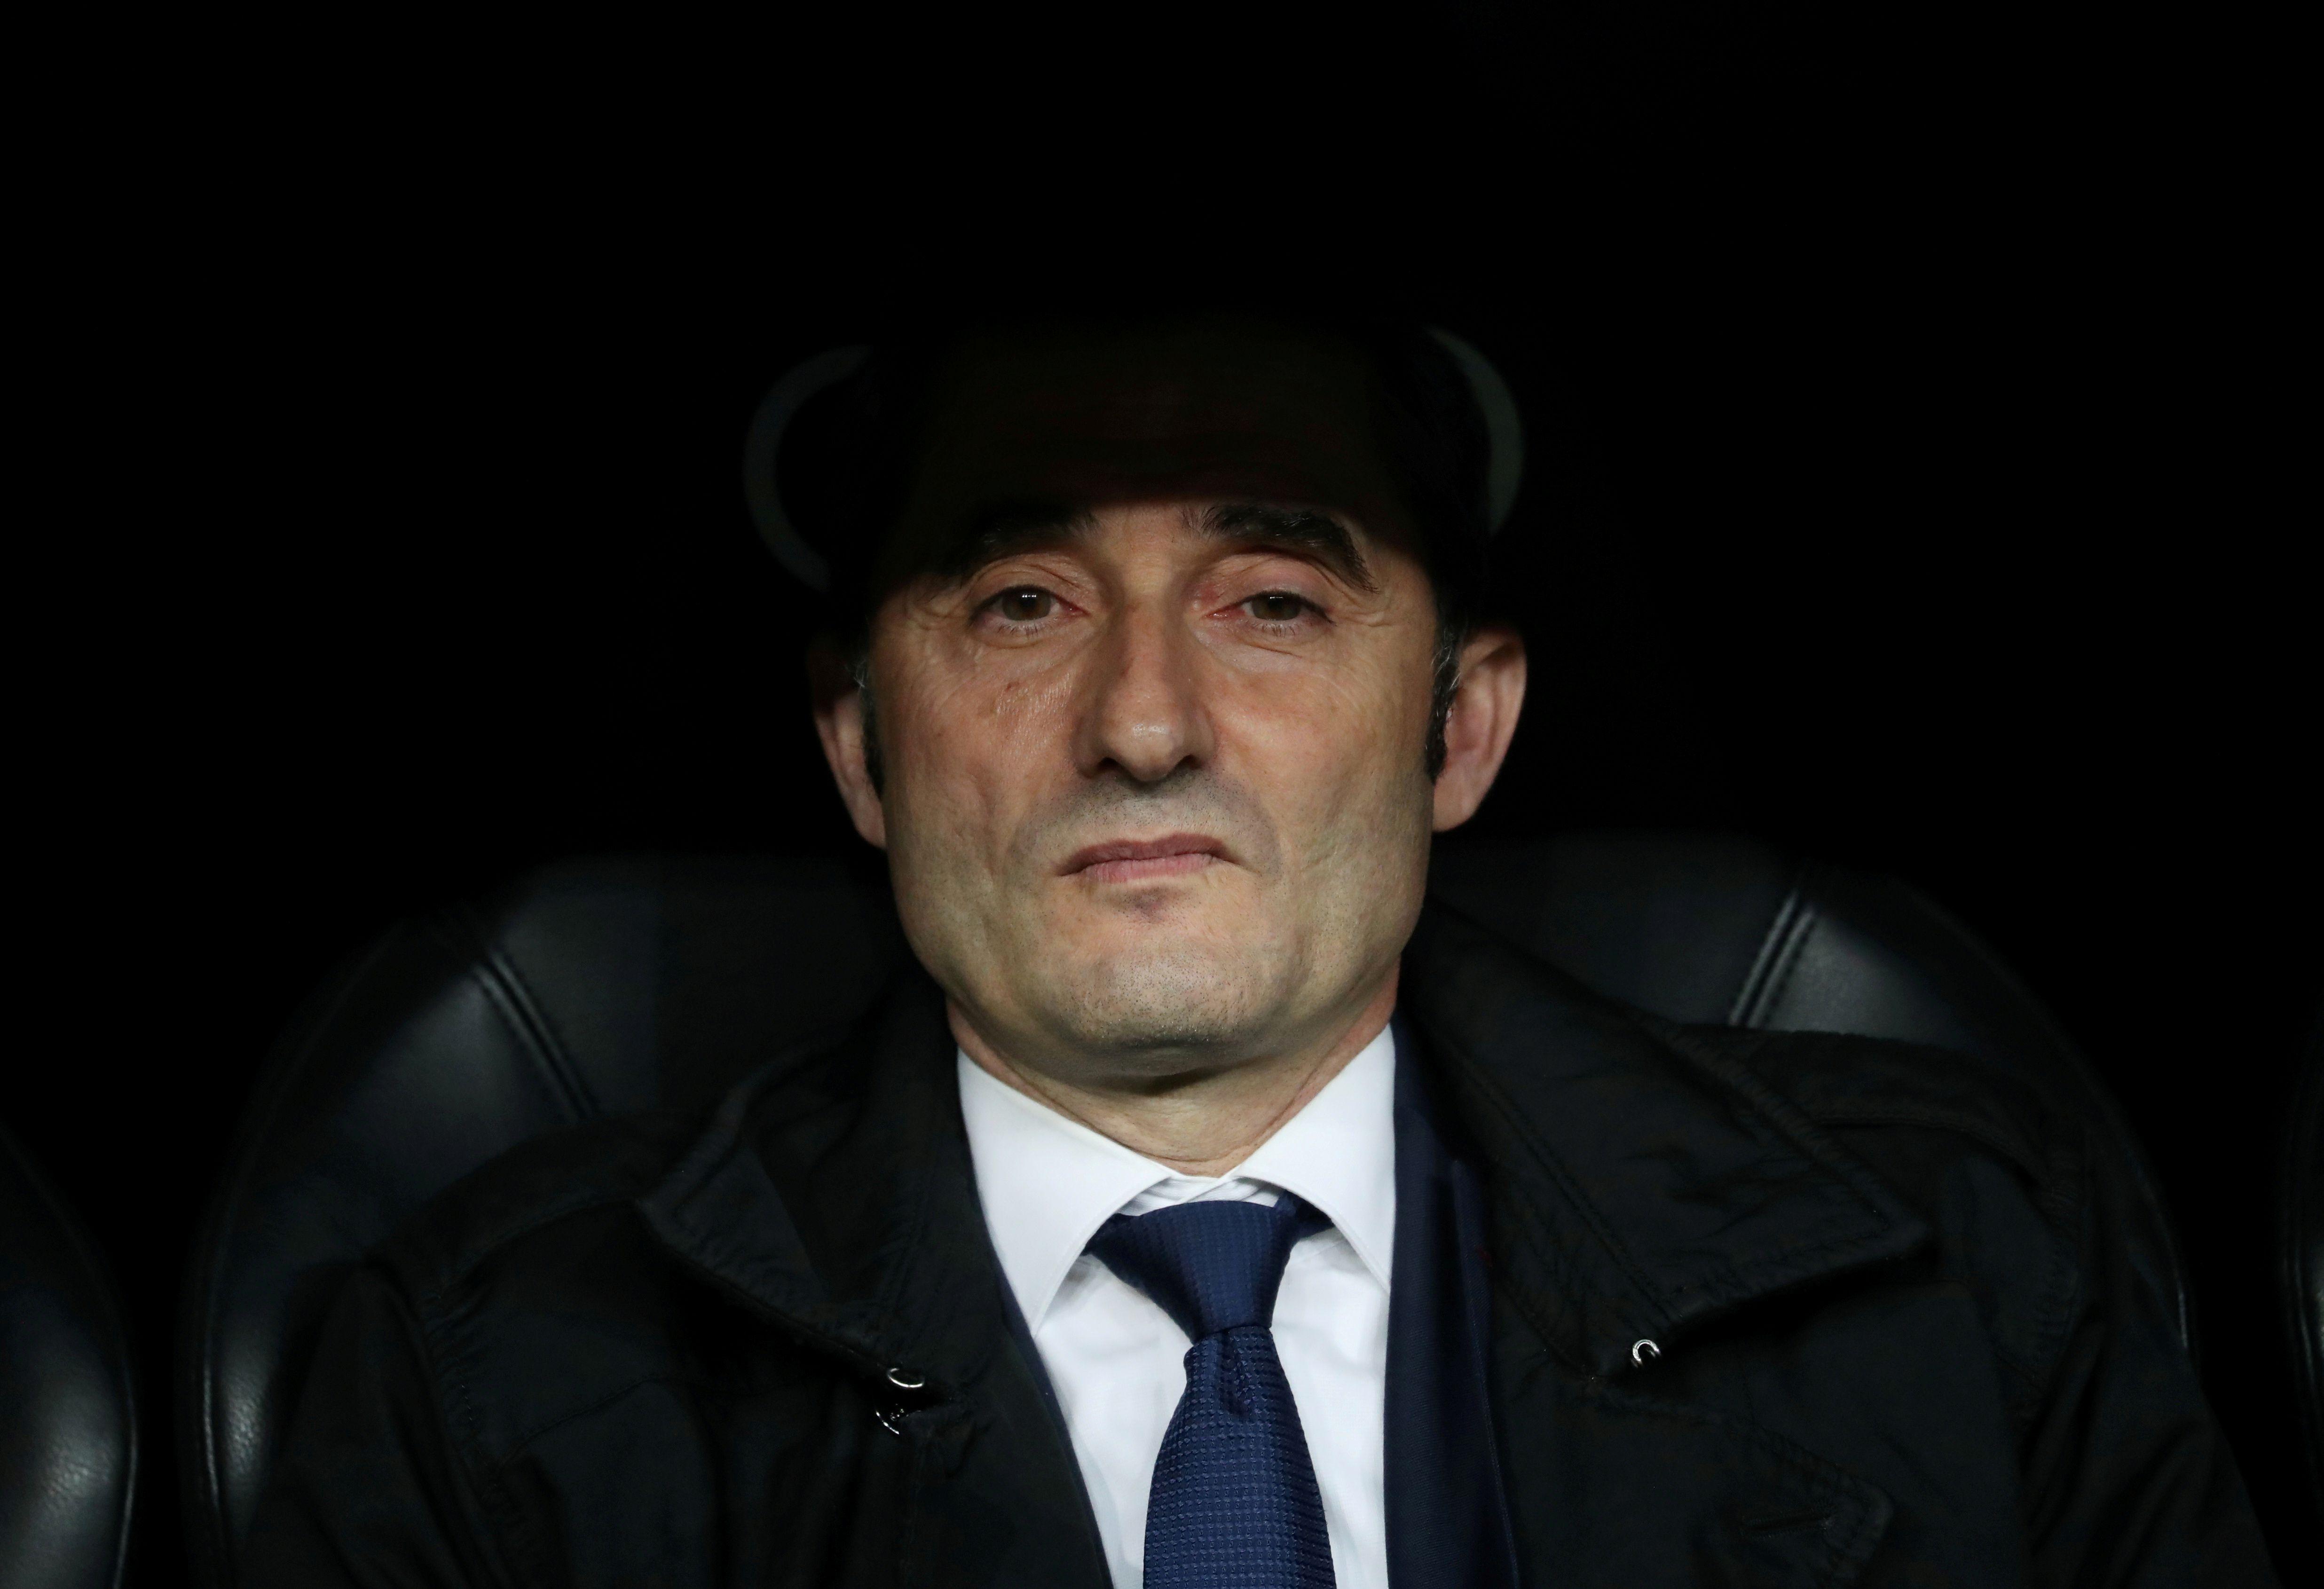 Valverde se despidió a través de una carta - REUTERS/Susana Vera/File Photo